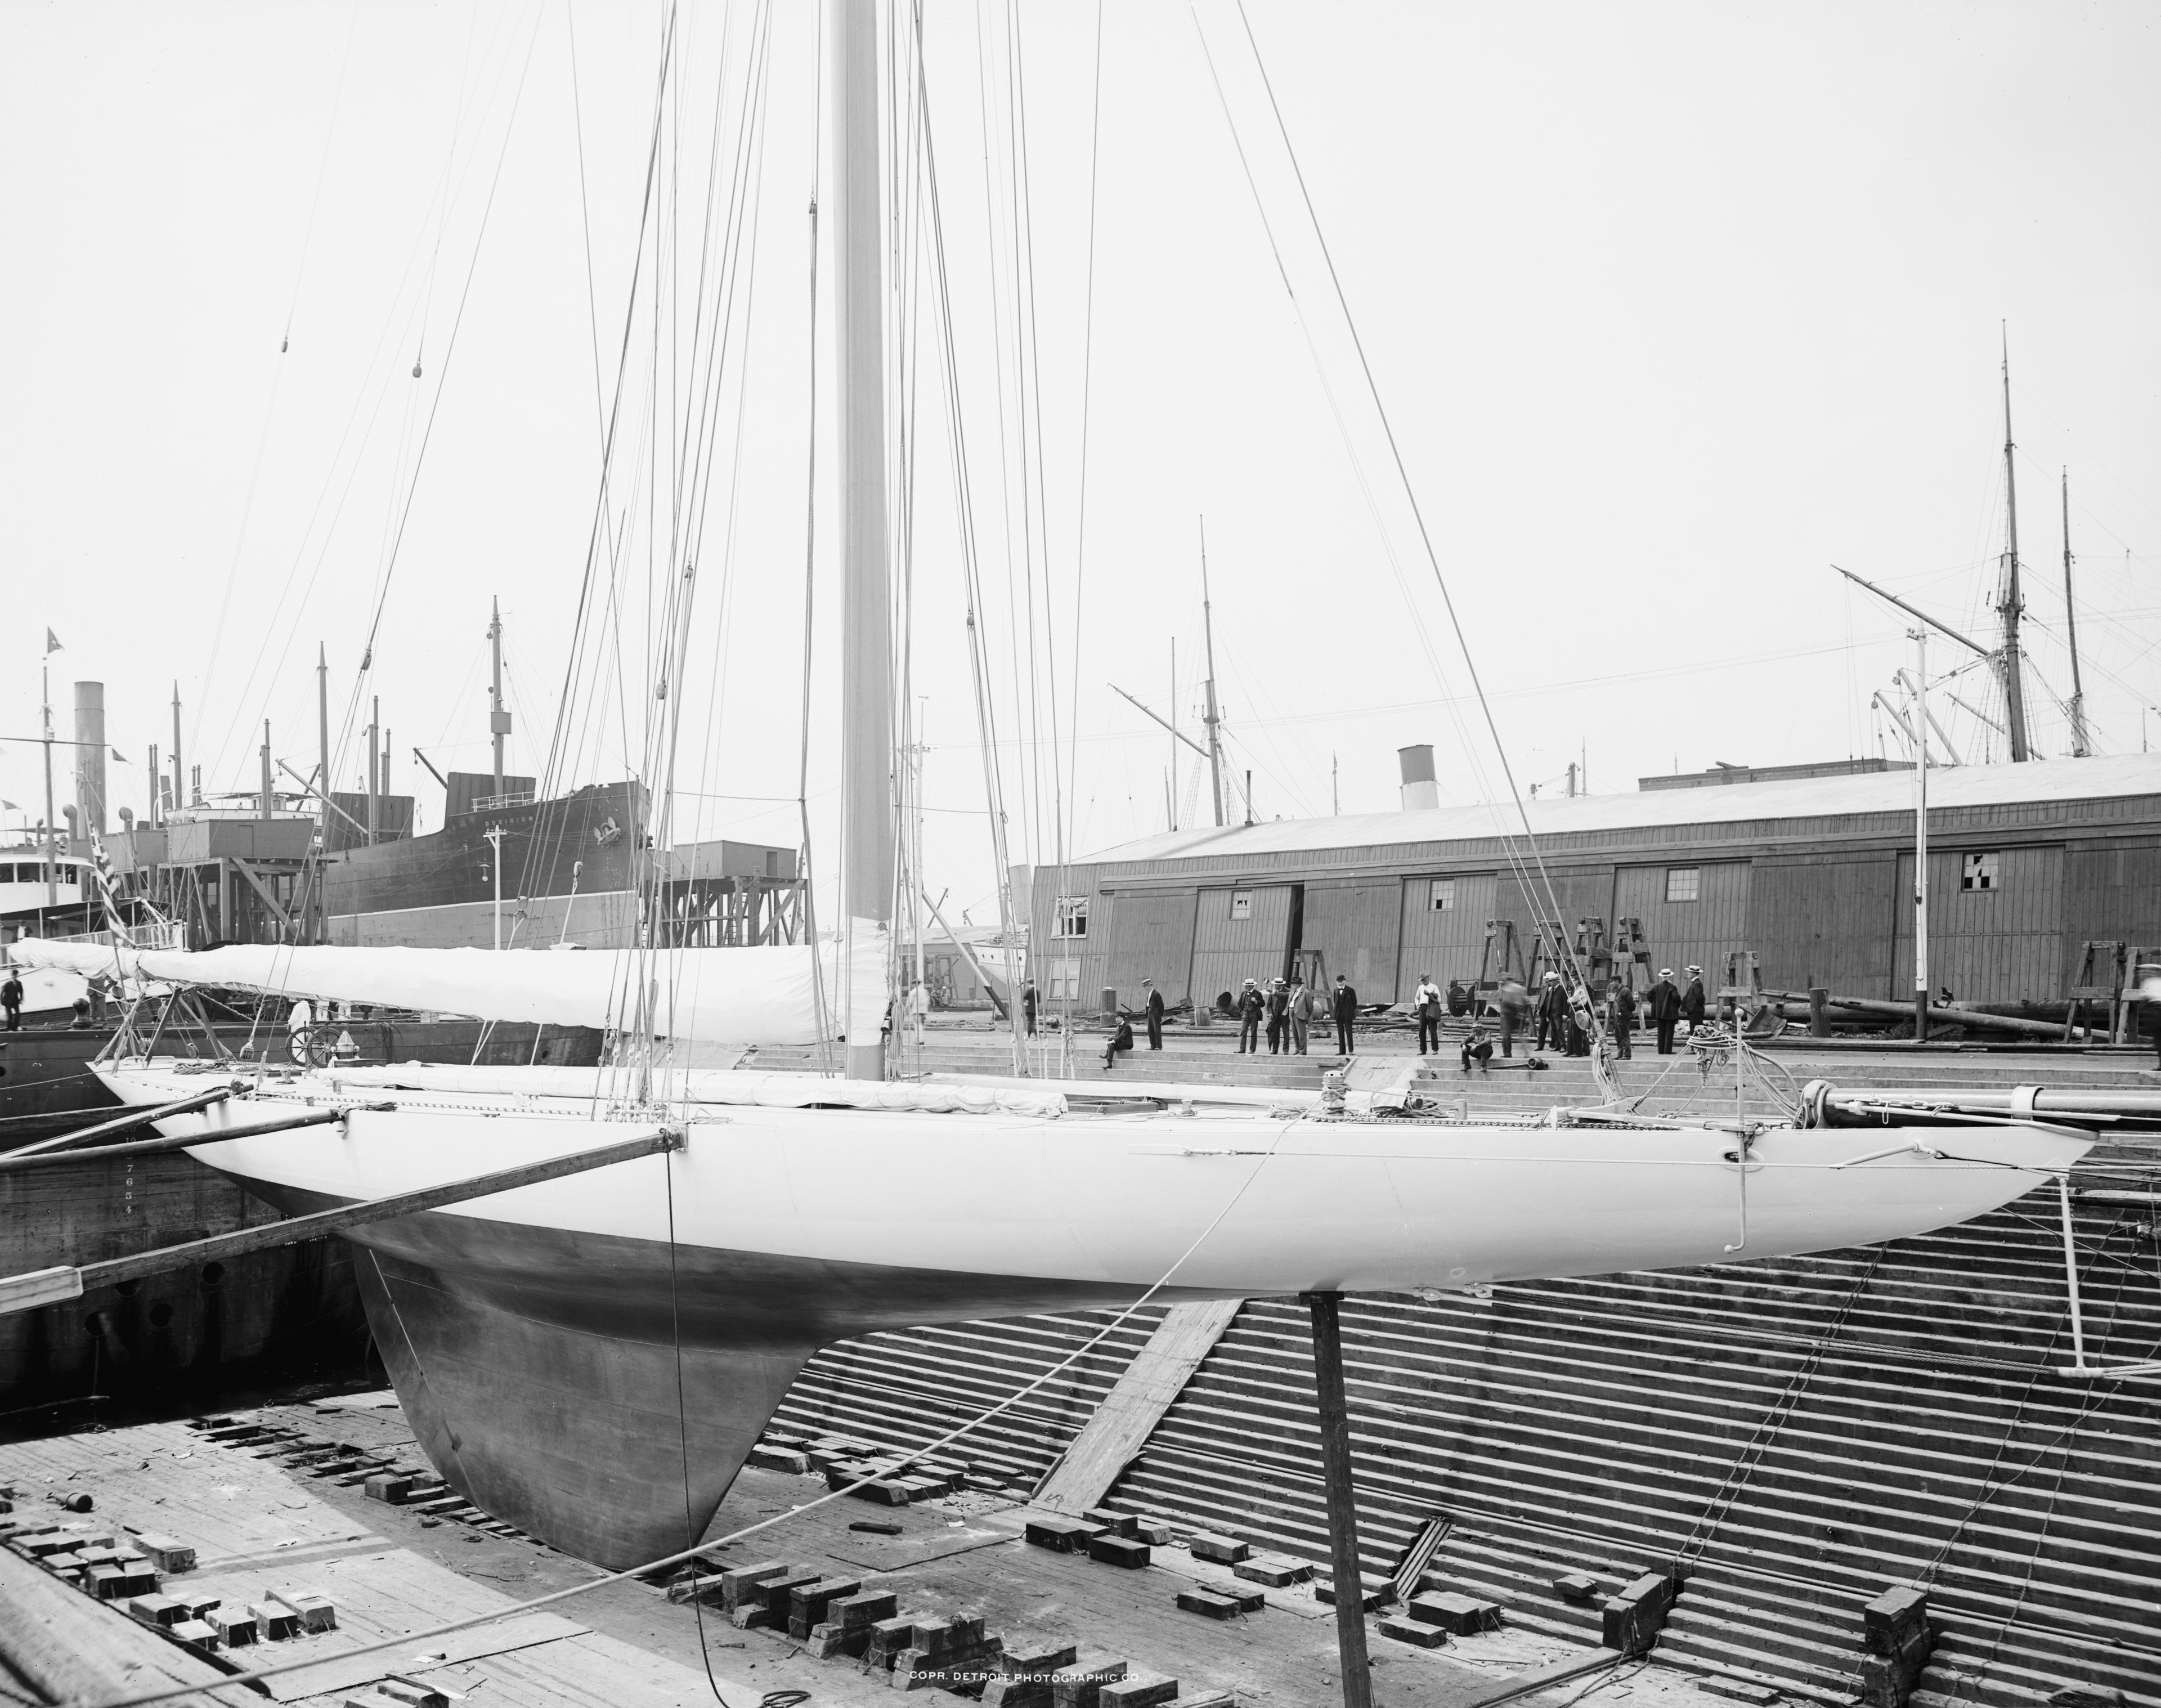 19.2 Yacht_Reliance_in_Drydock